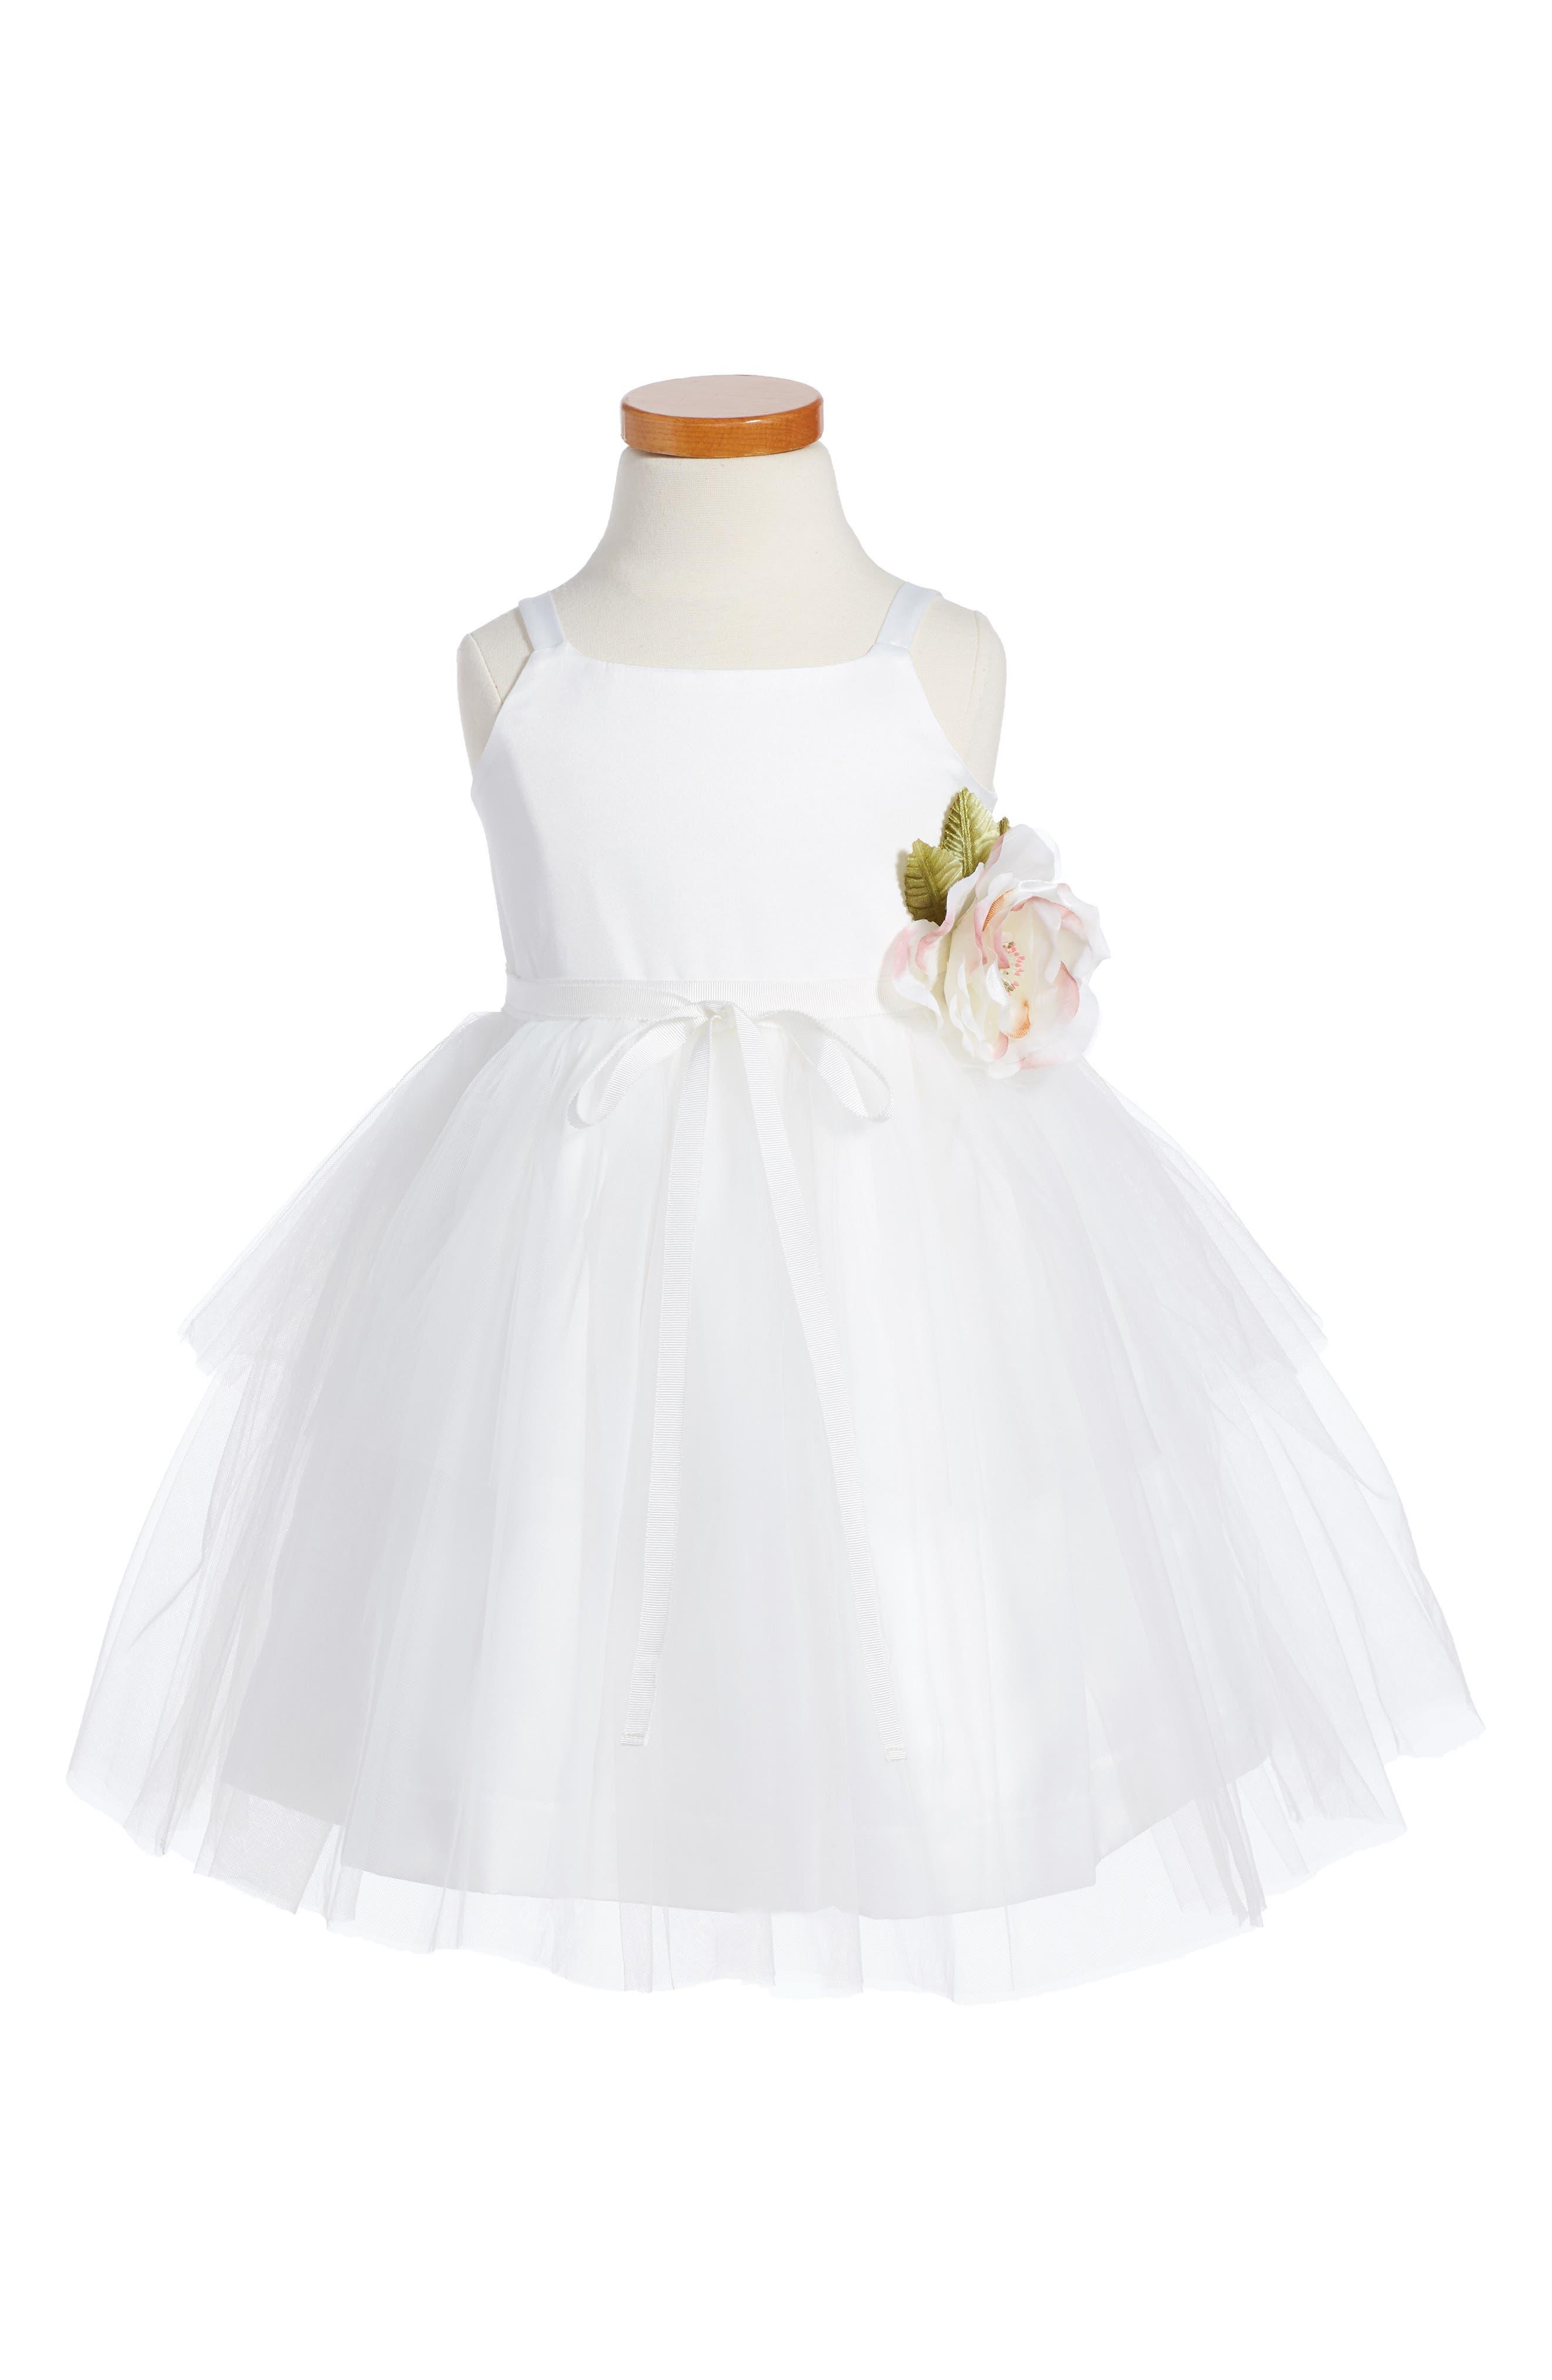 US ANGELS 'Ballerina' Dress, Main, color, IVORY